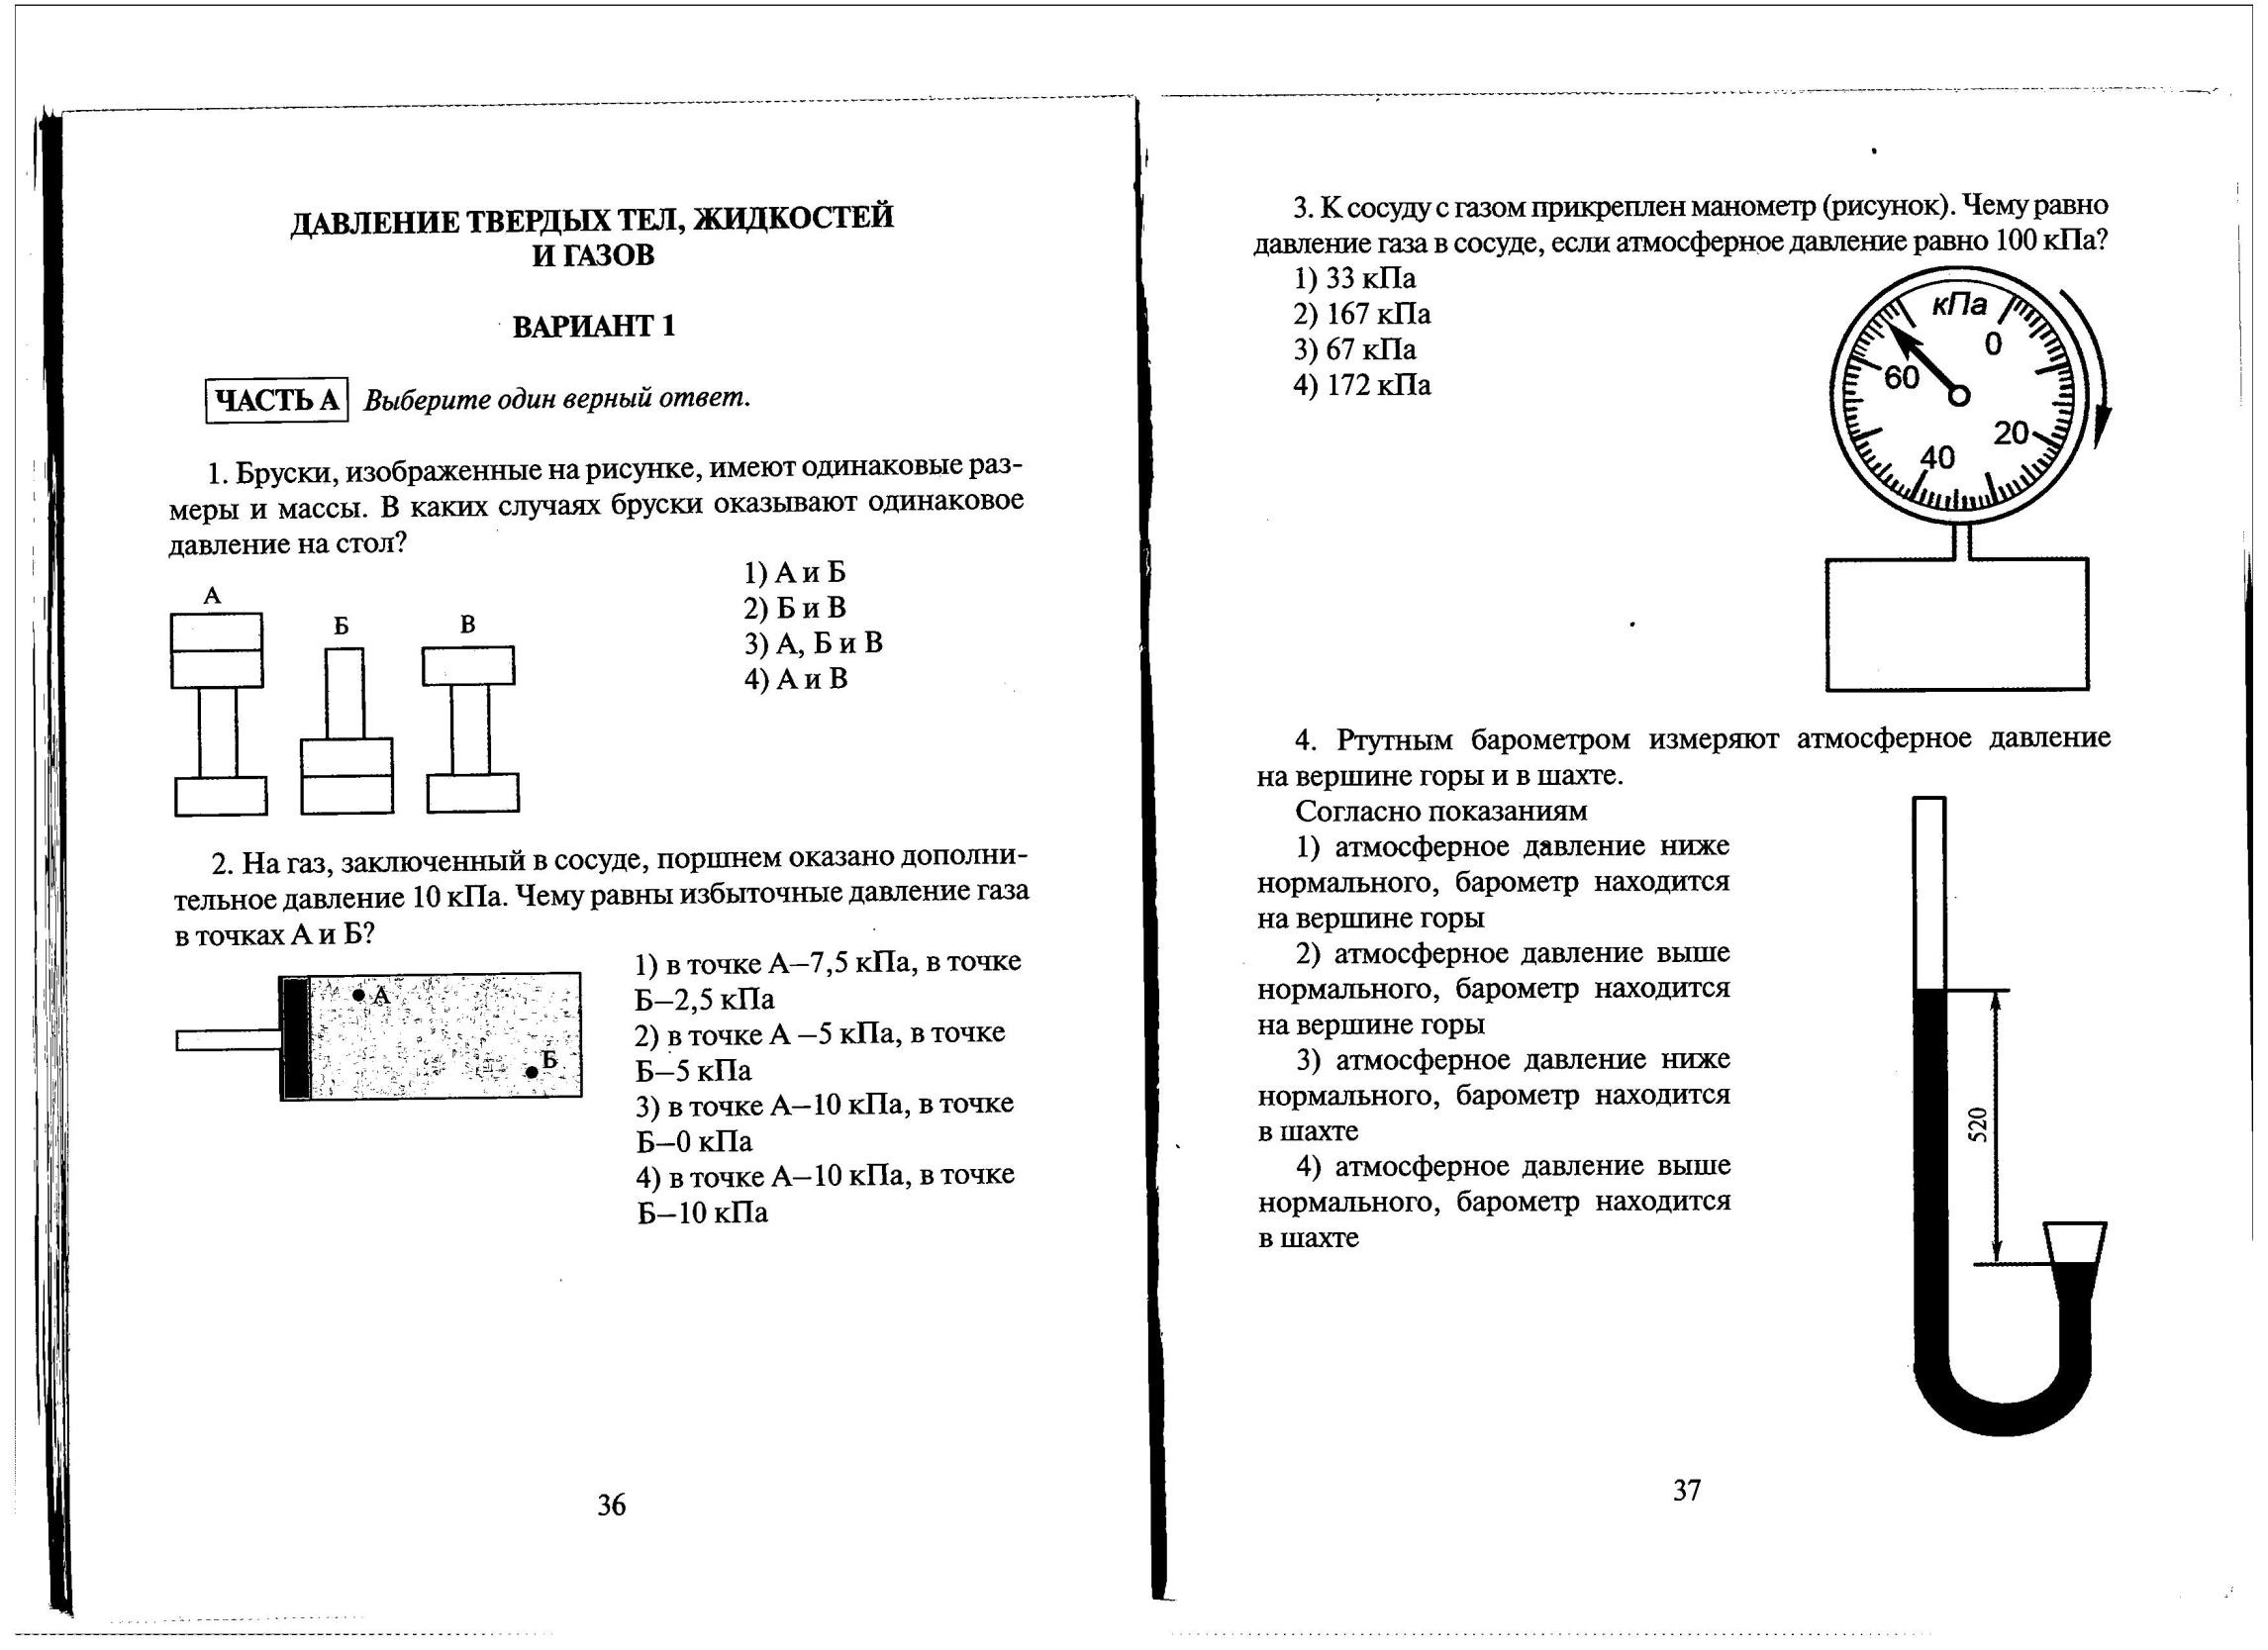 C:\Users\1\Desktop\физика 7 класс кр\14.jpeg